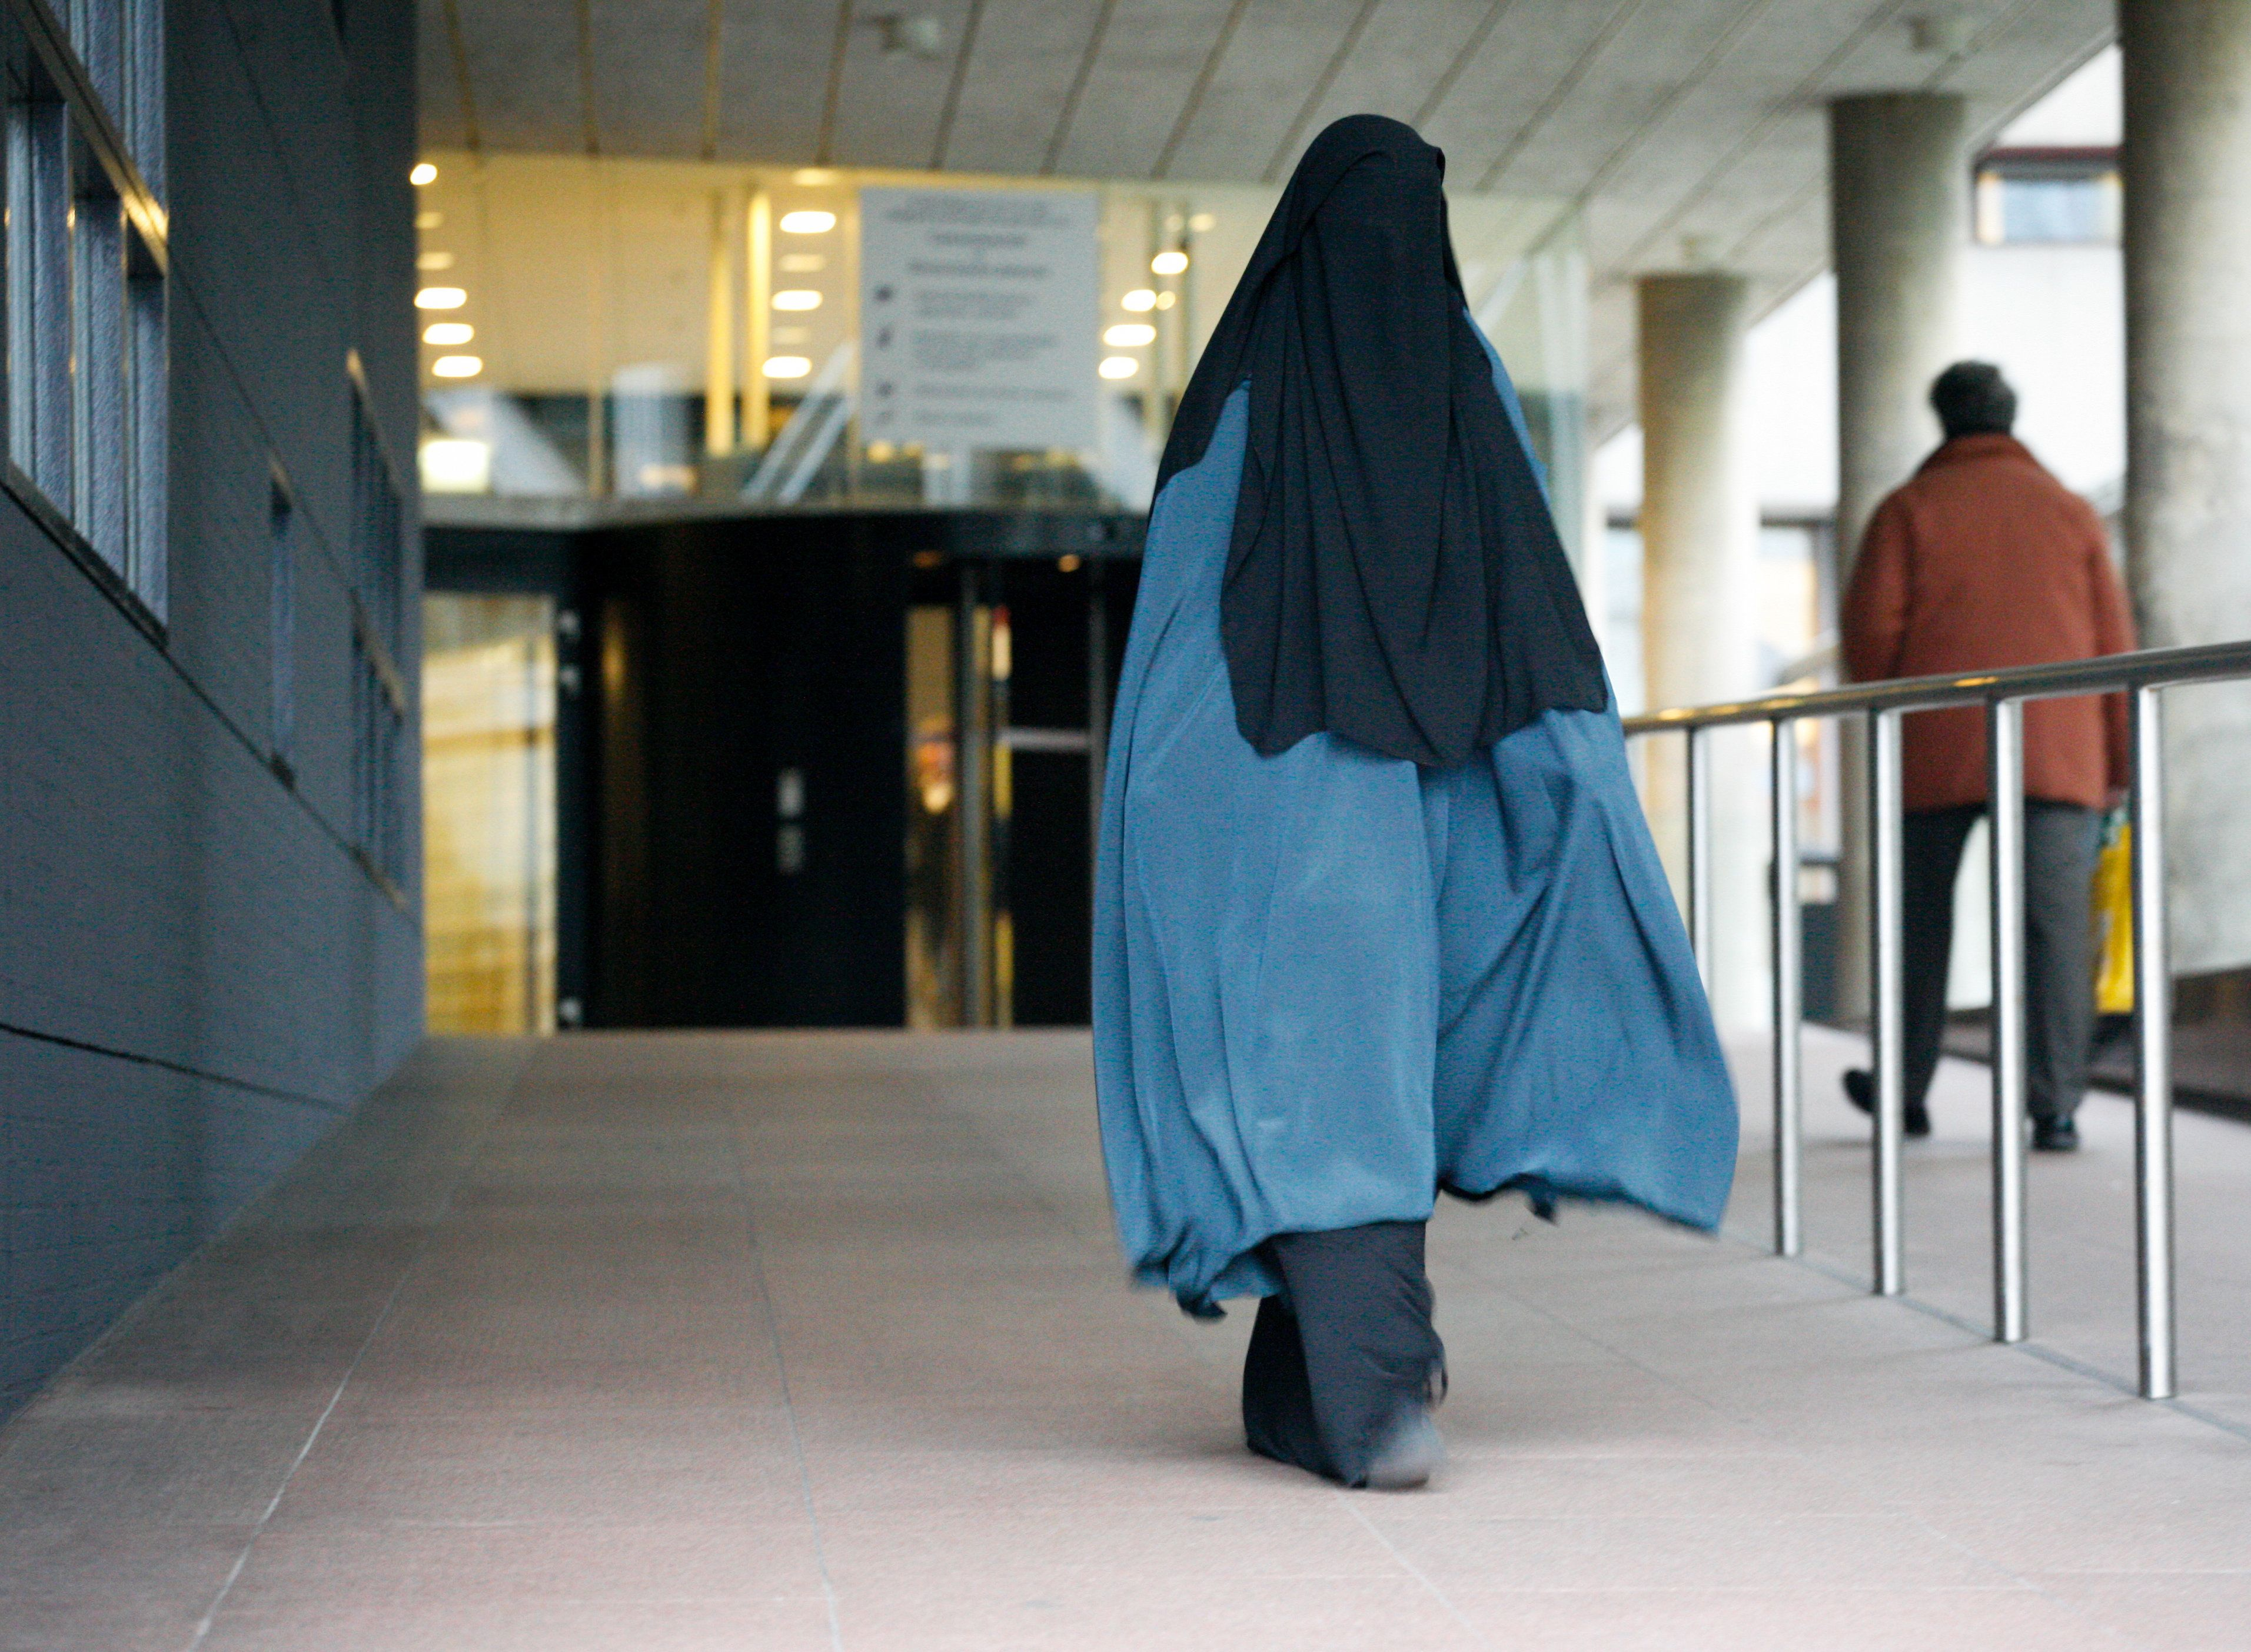 burqa pipe gay les gars sexe vidéos